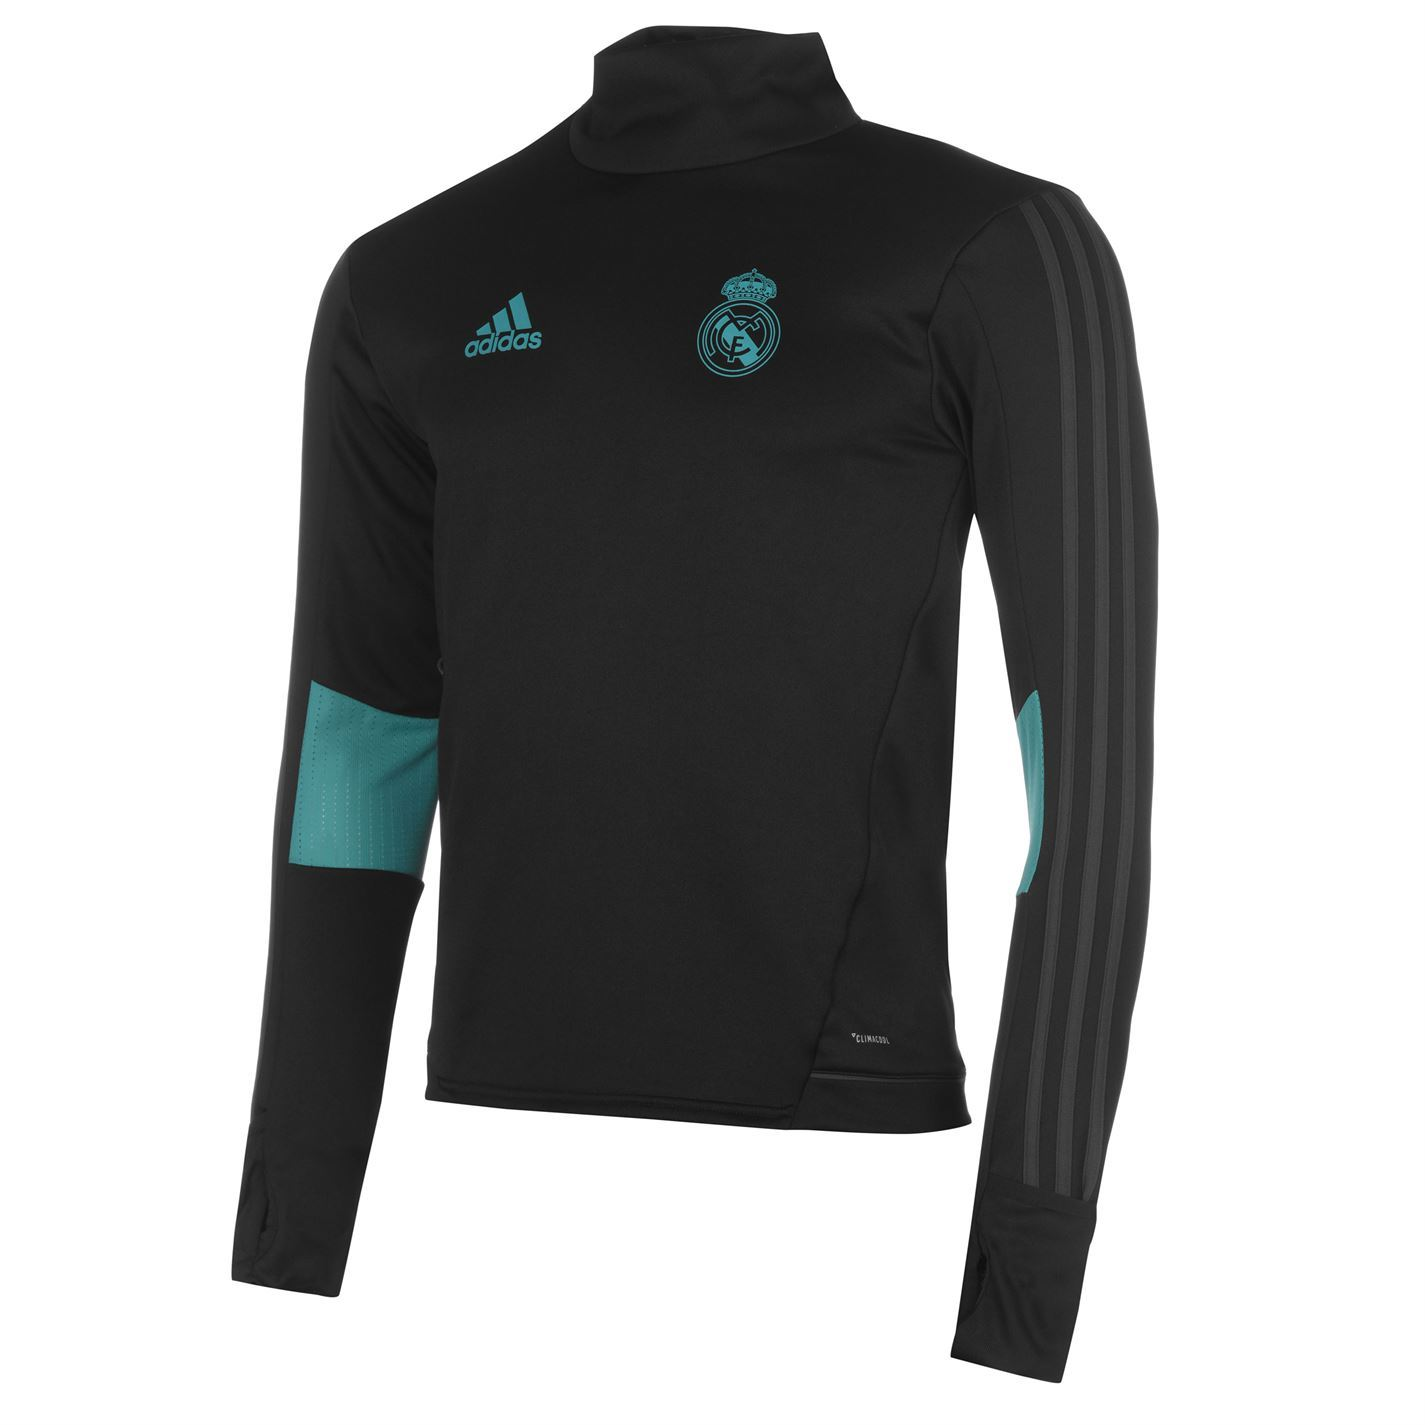 Details about adidas Real Madrid CF Training Sweatshirt Mens Black Football Soccer Sweater Top